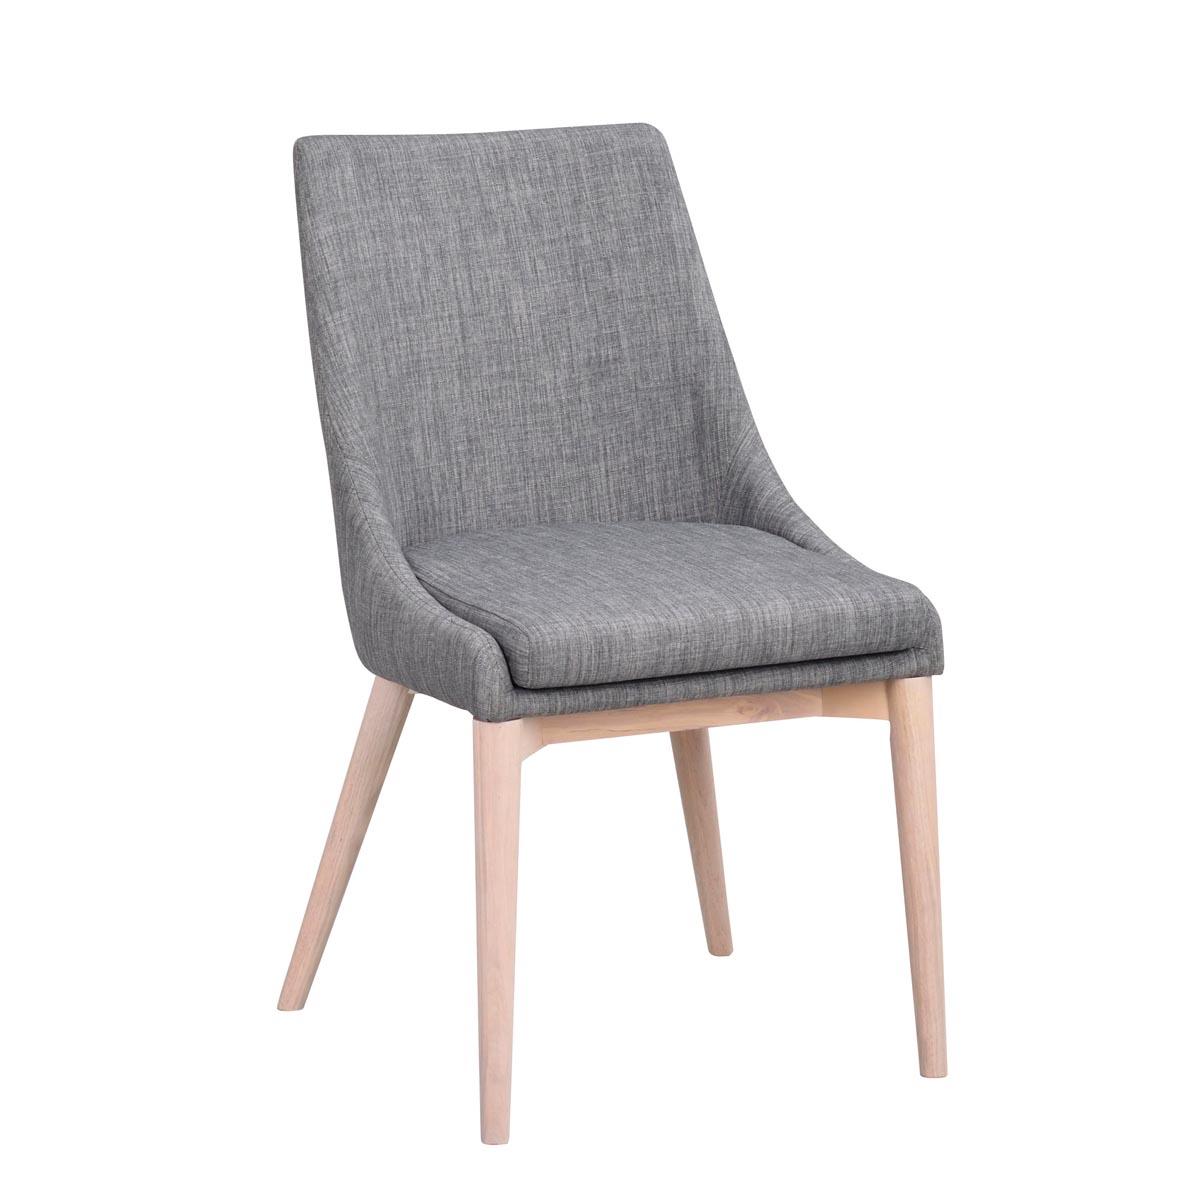 Bea-stol-mörkgrått-tyg_wwR-118322_a